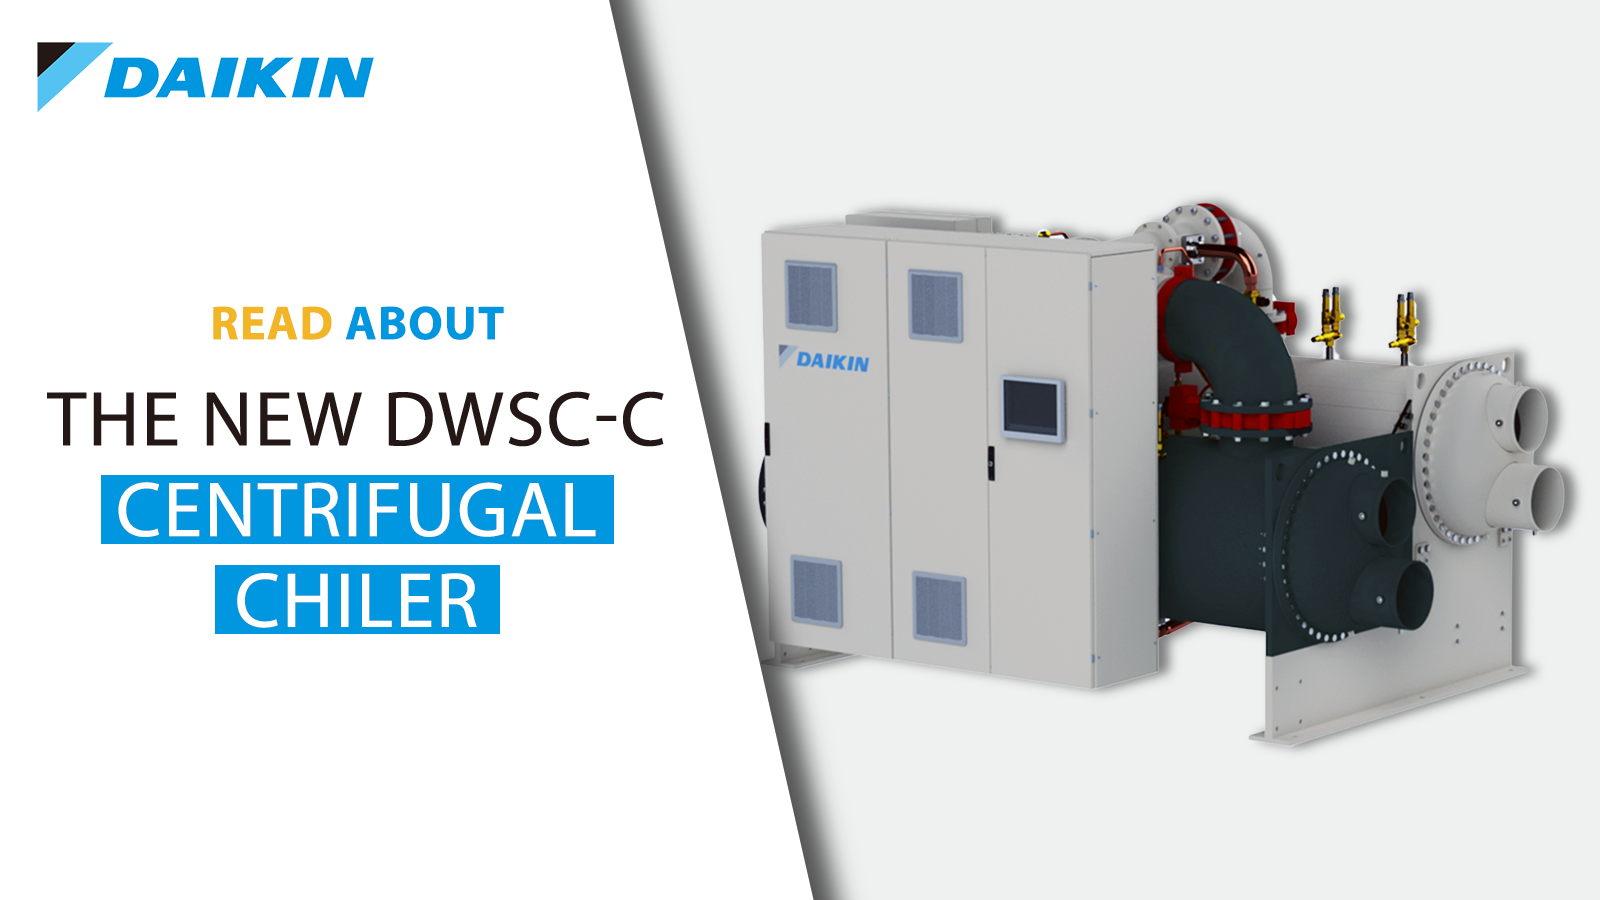 The new DWSC-C centrifugal chiller